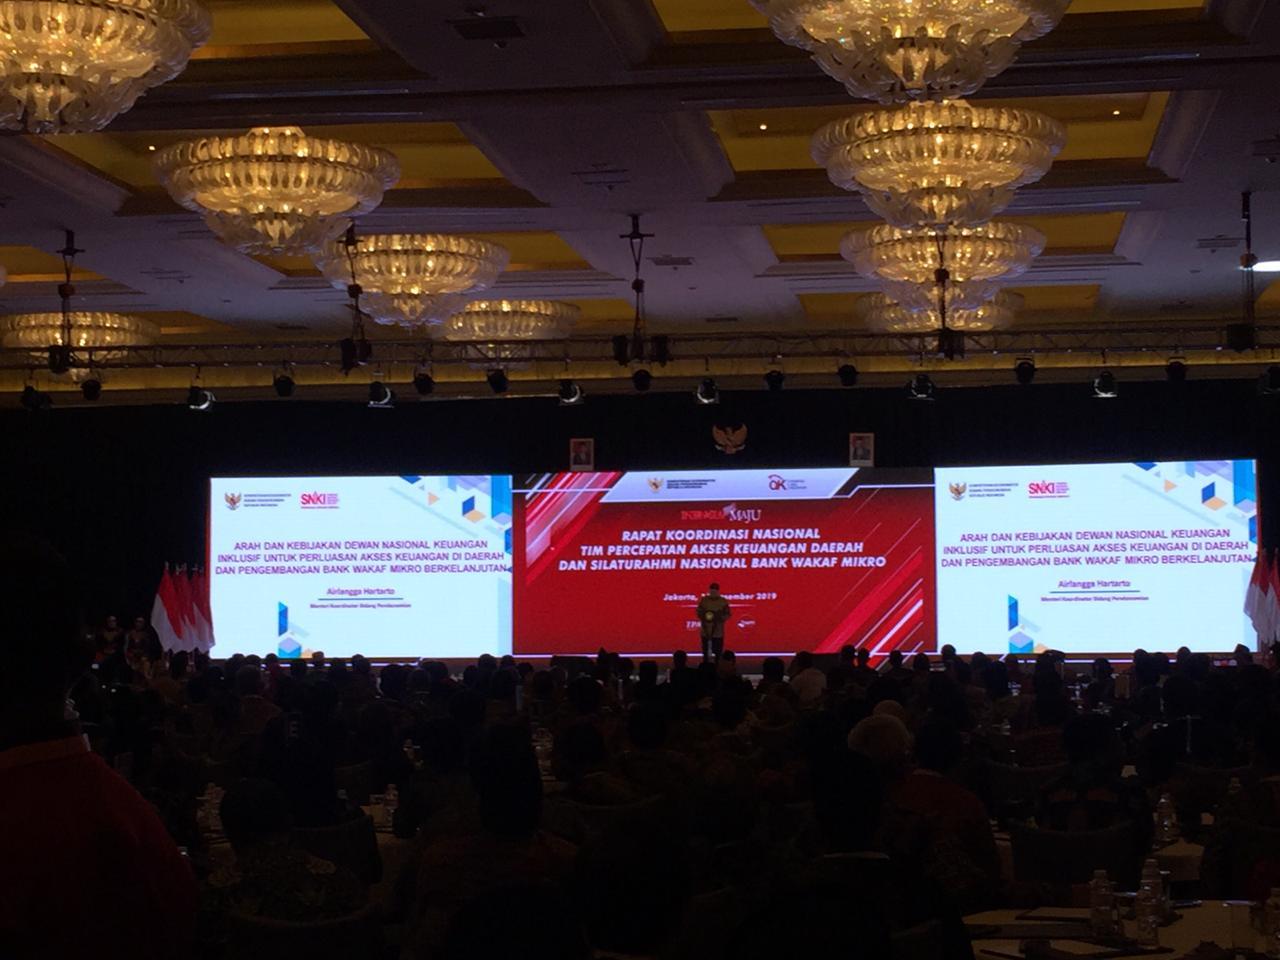 https: img-k.okeinfo.net content 2019 12 10 20 2140135 pertumbuhan-ekonomi-indonesia-hanya-5-jokowi-patut-disyukuri-lyTxzW1Jki.jpg